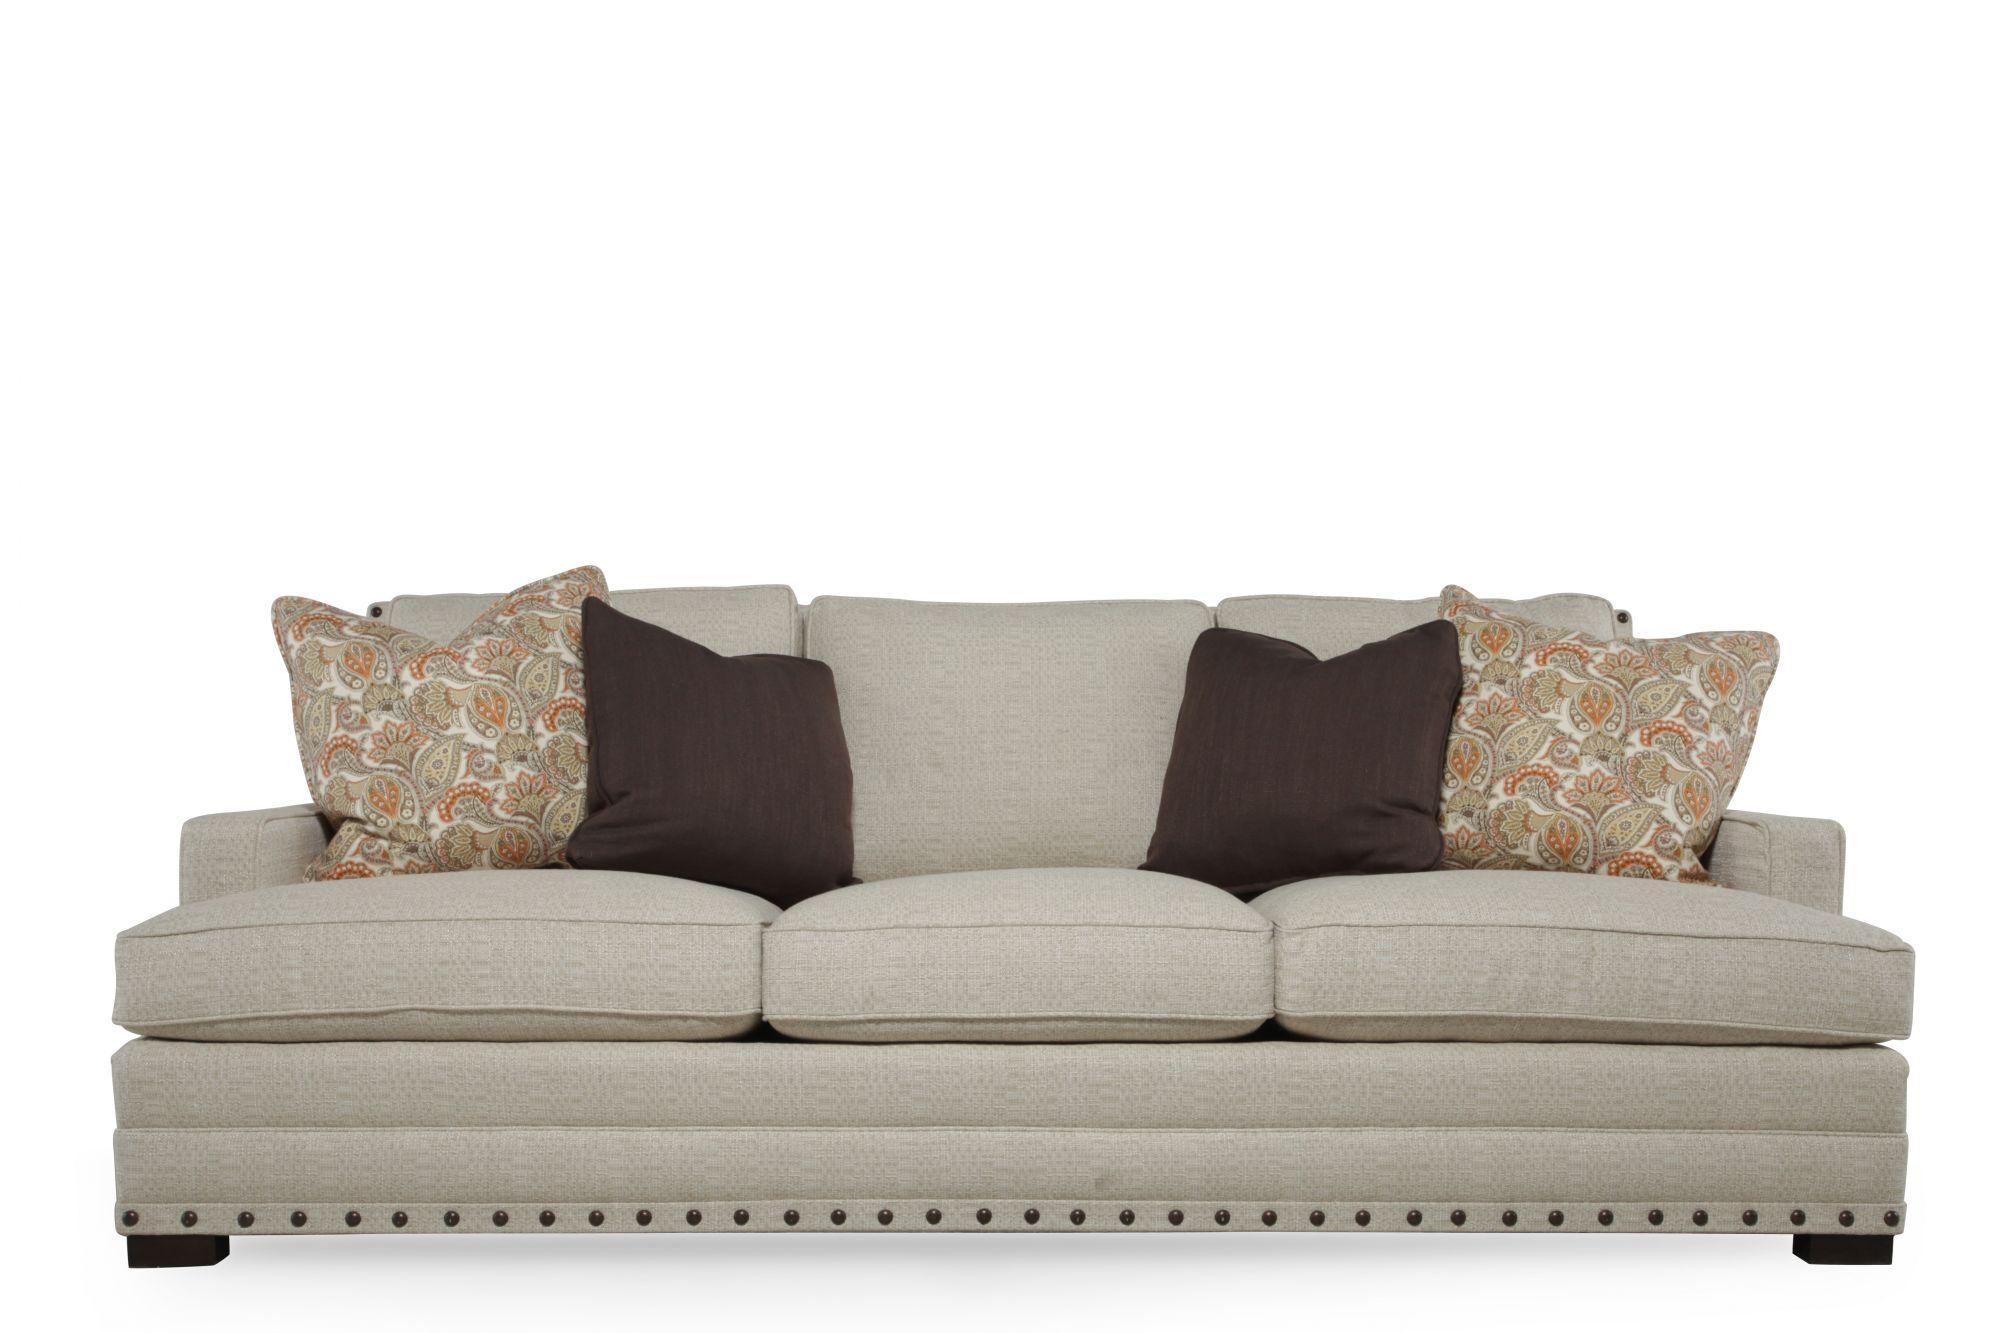 Bernhardt Furniture Sofa | Sofa Gallery | Kengire In Bernhardt Tarleton Sofas (Image 3 of 20)